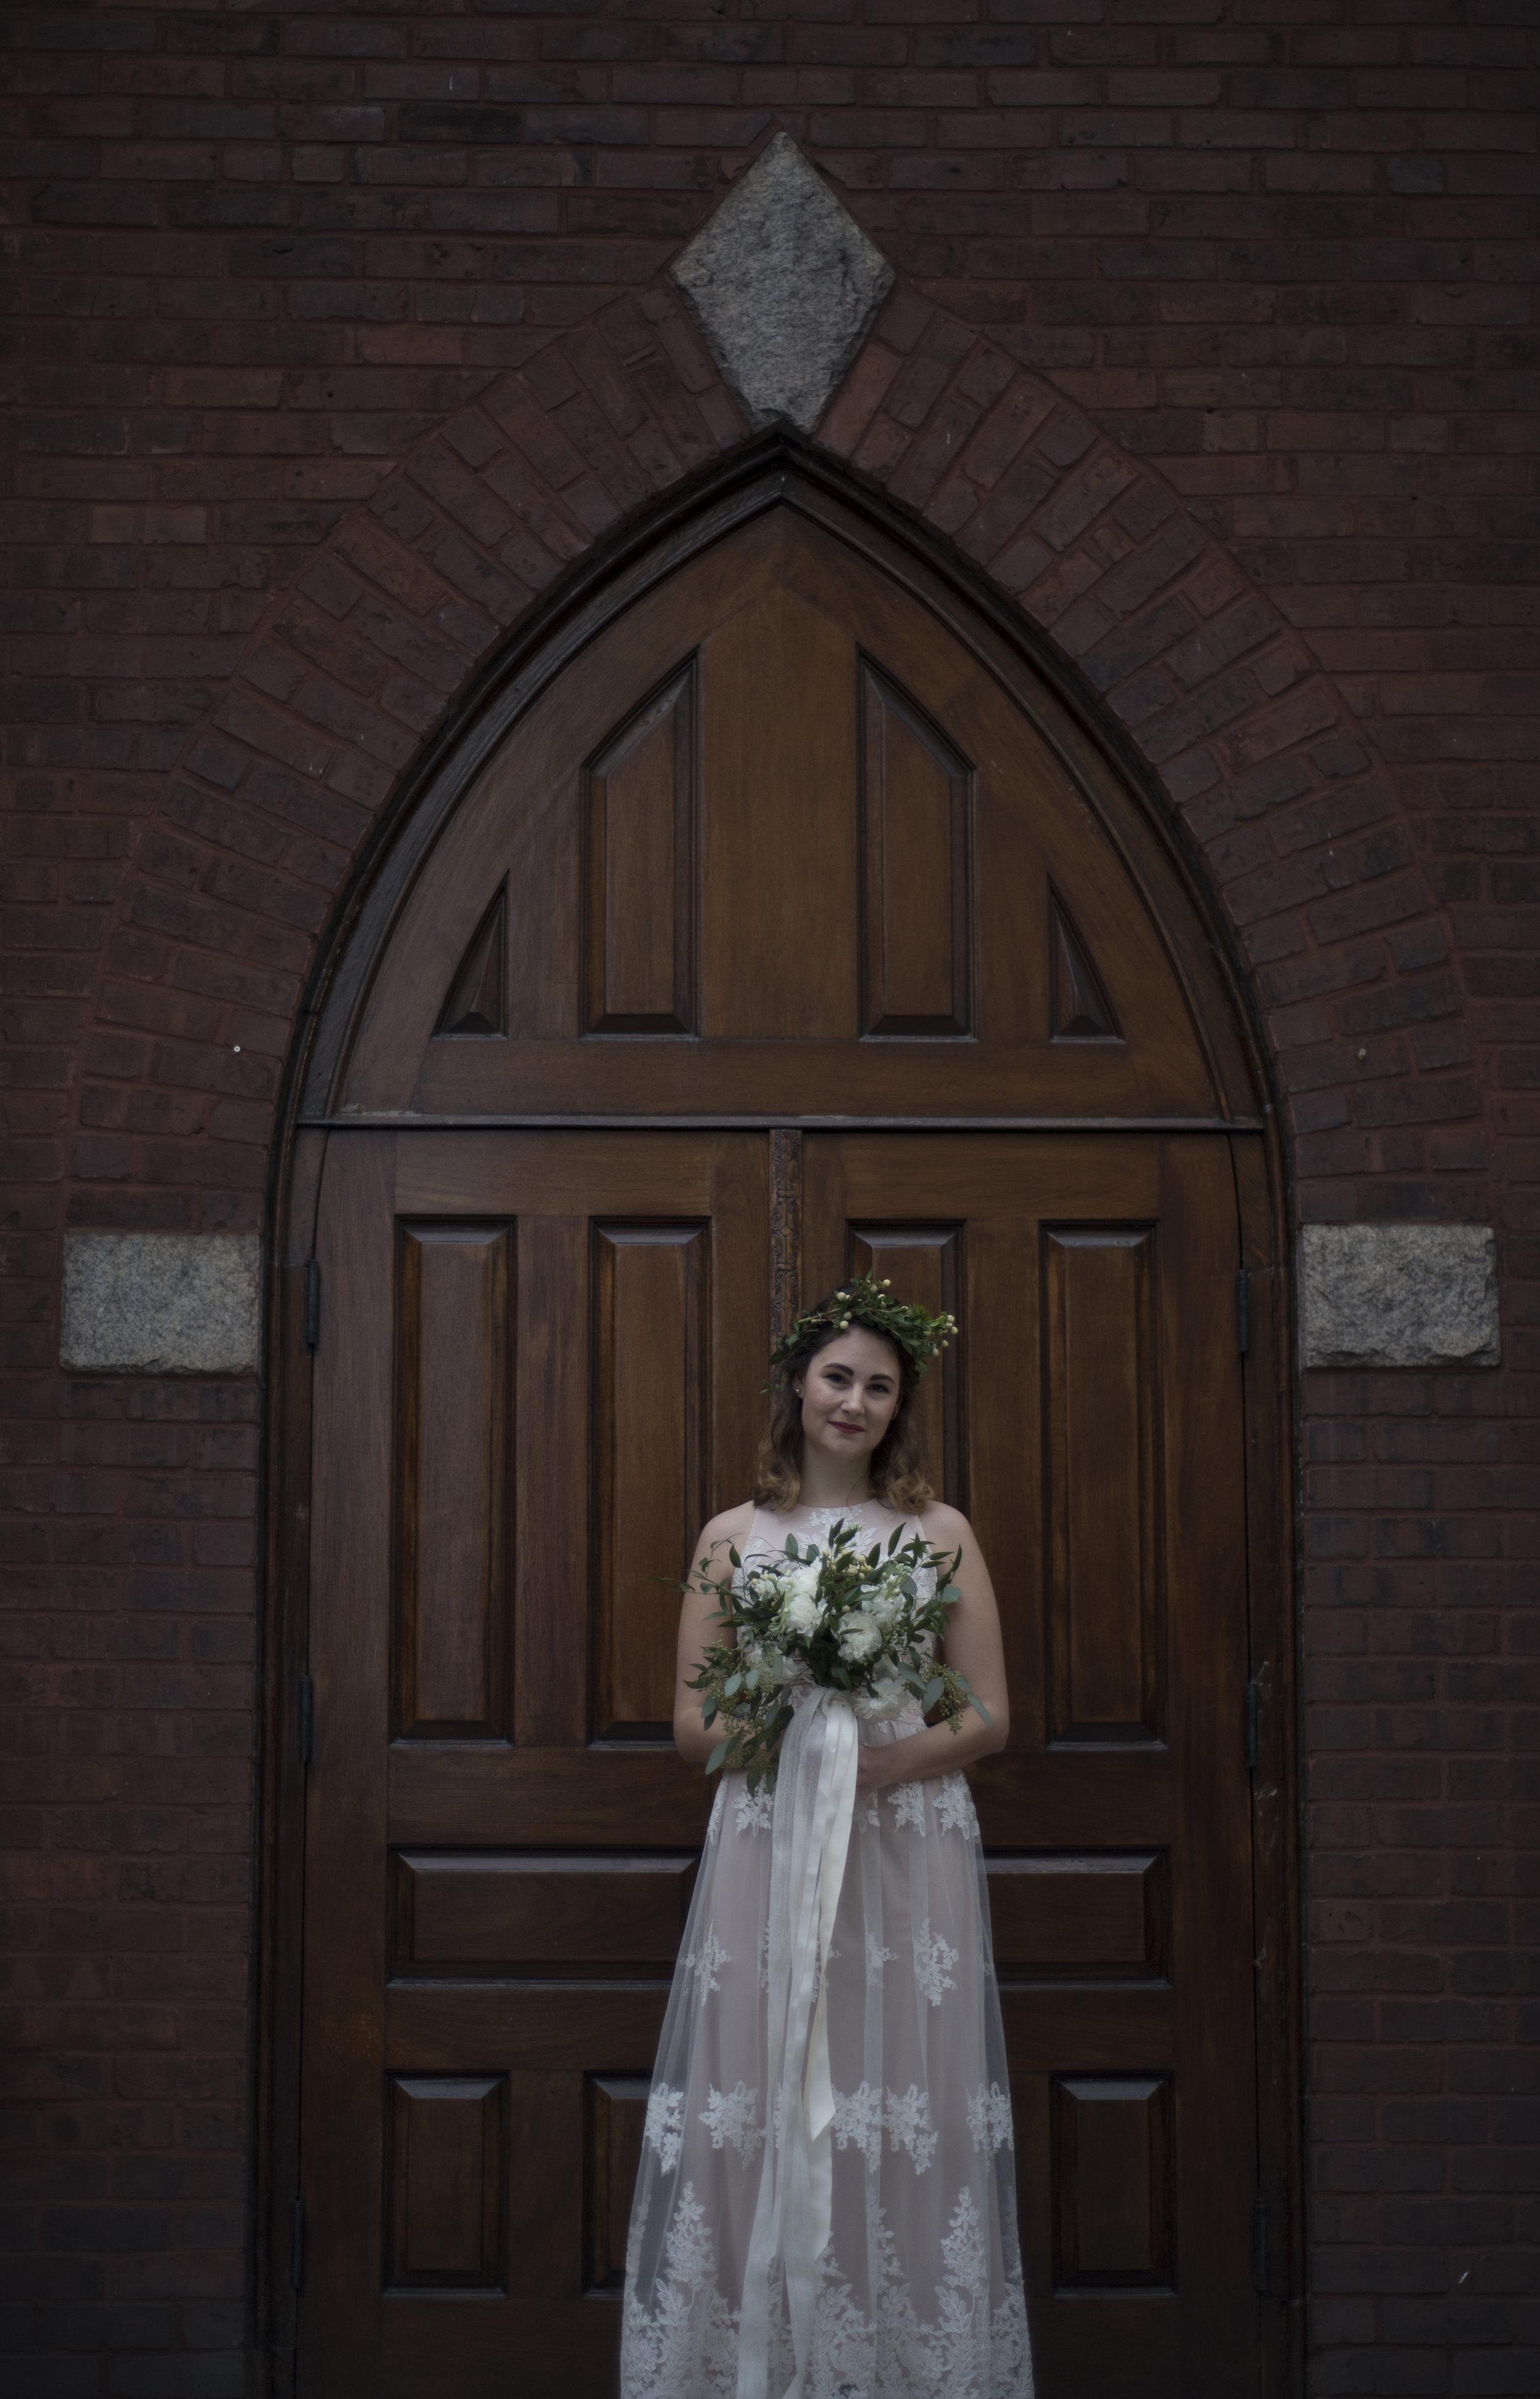 uptown charlotte north carolina winter white bridal portrait session.jpg